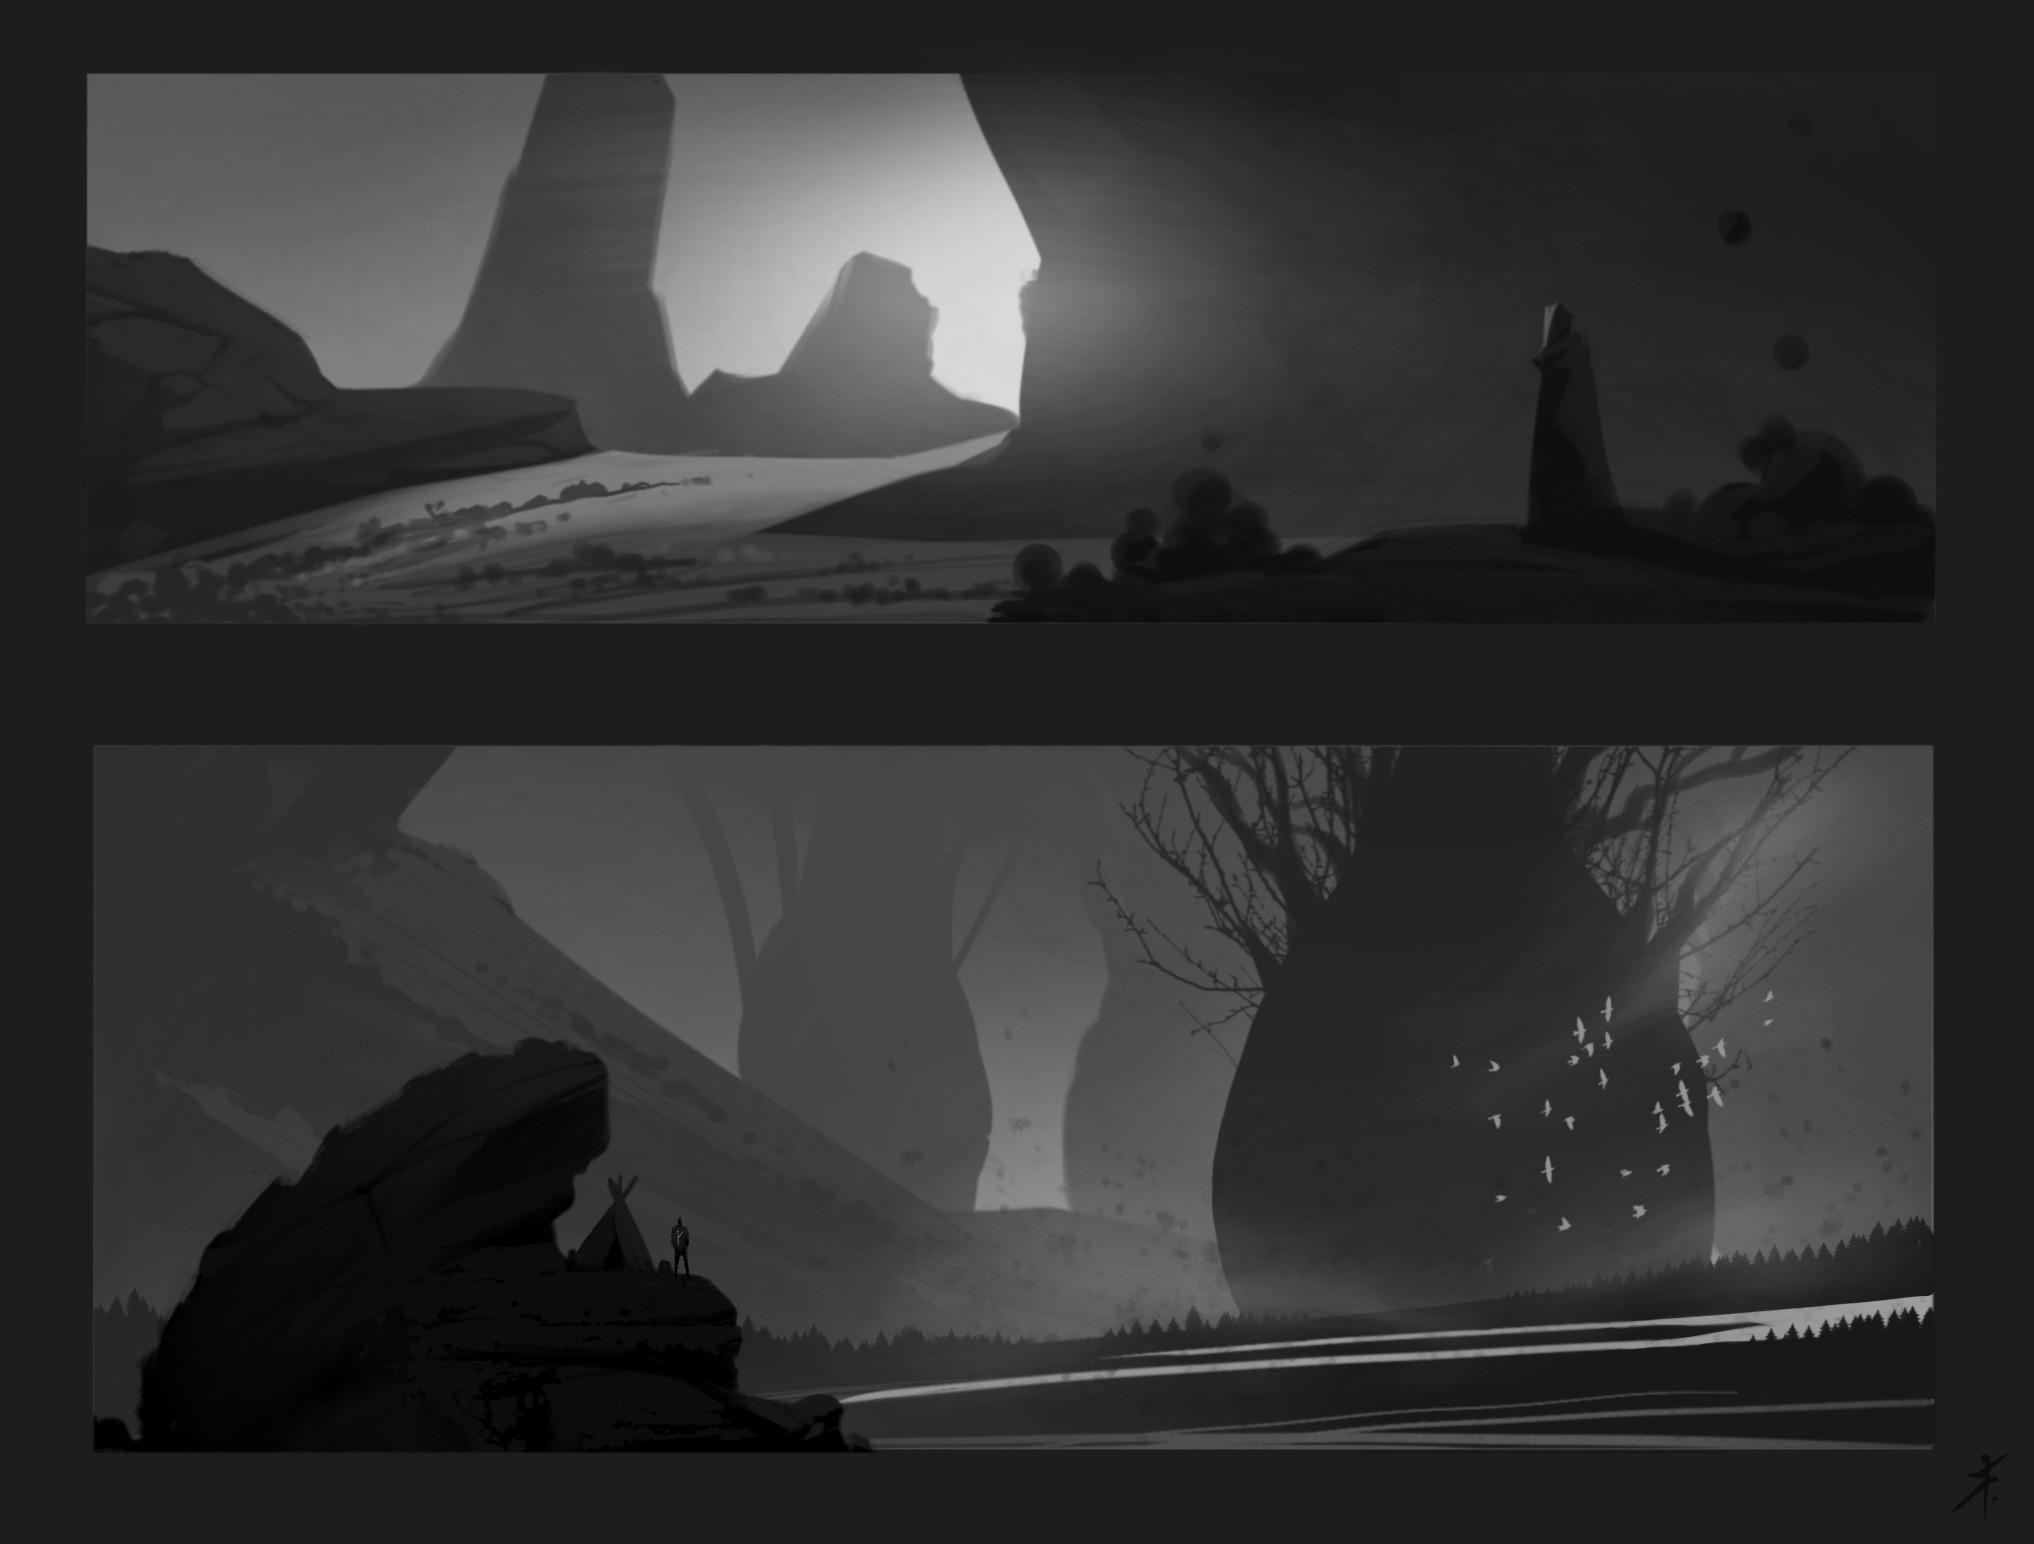 Original thumbnail sketches